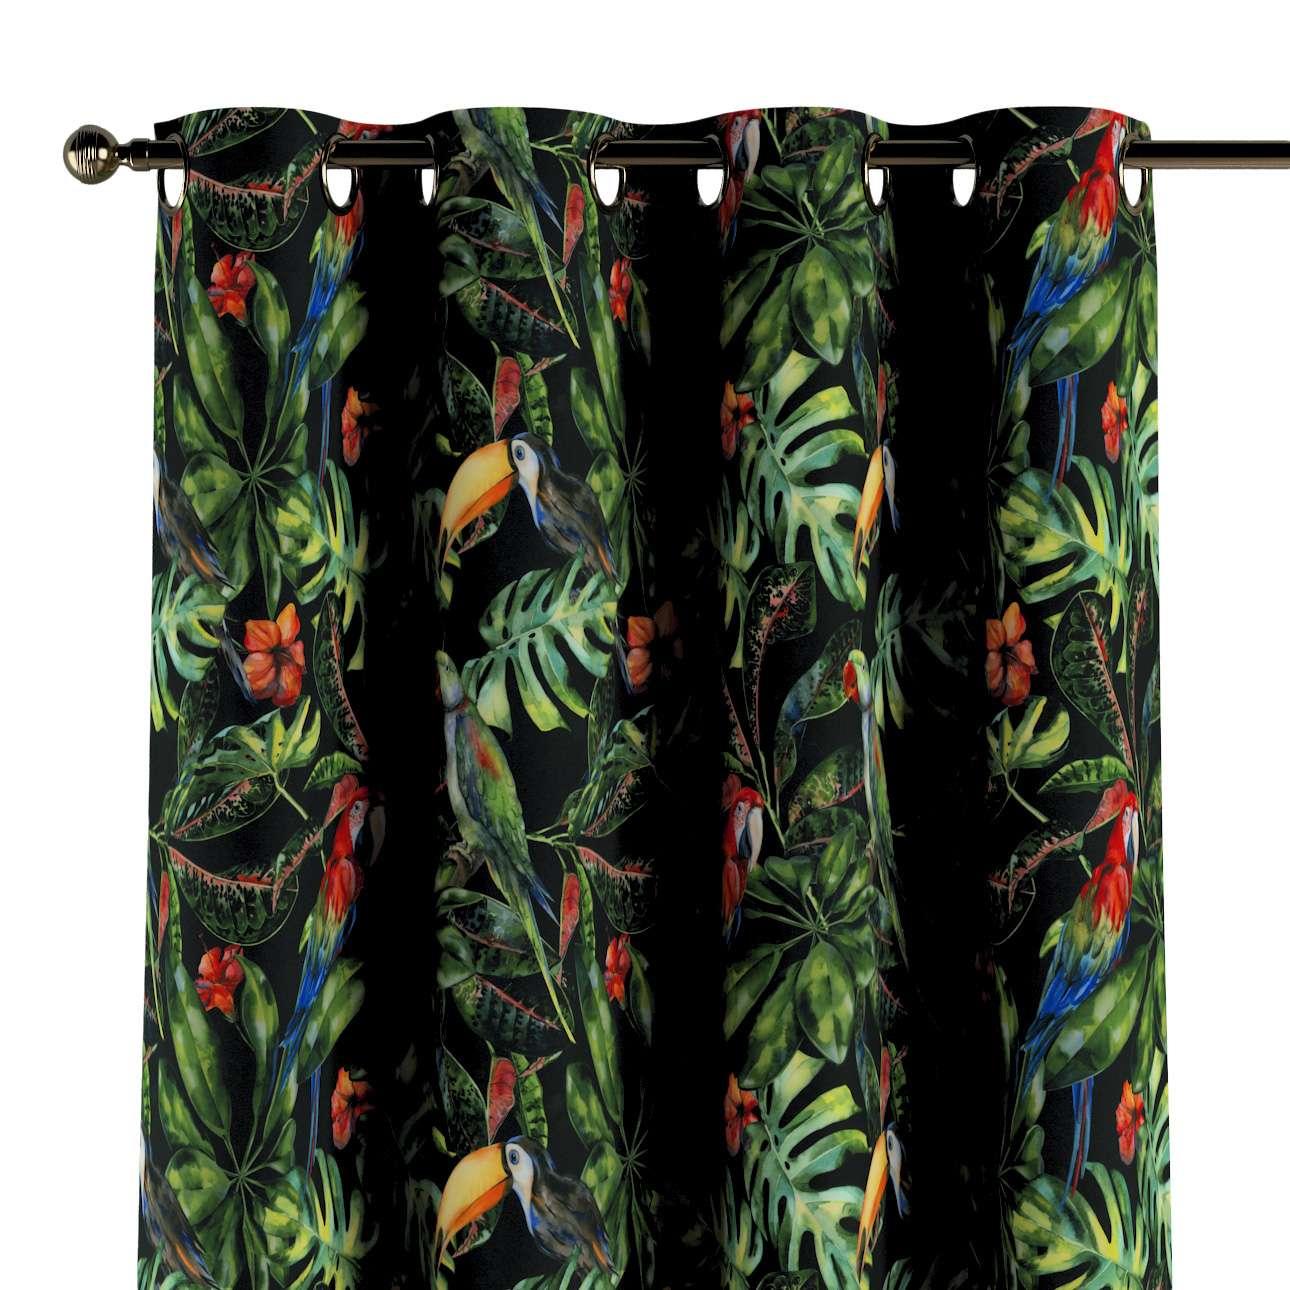 Zasłona na kółkach 1 szt. w kolekcji Velvet, tkanina: 704-28